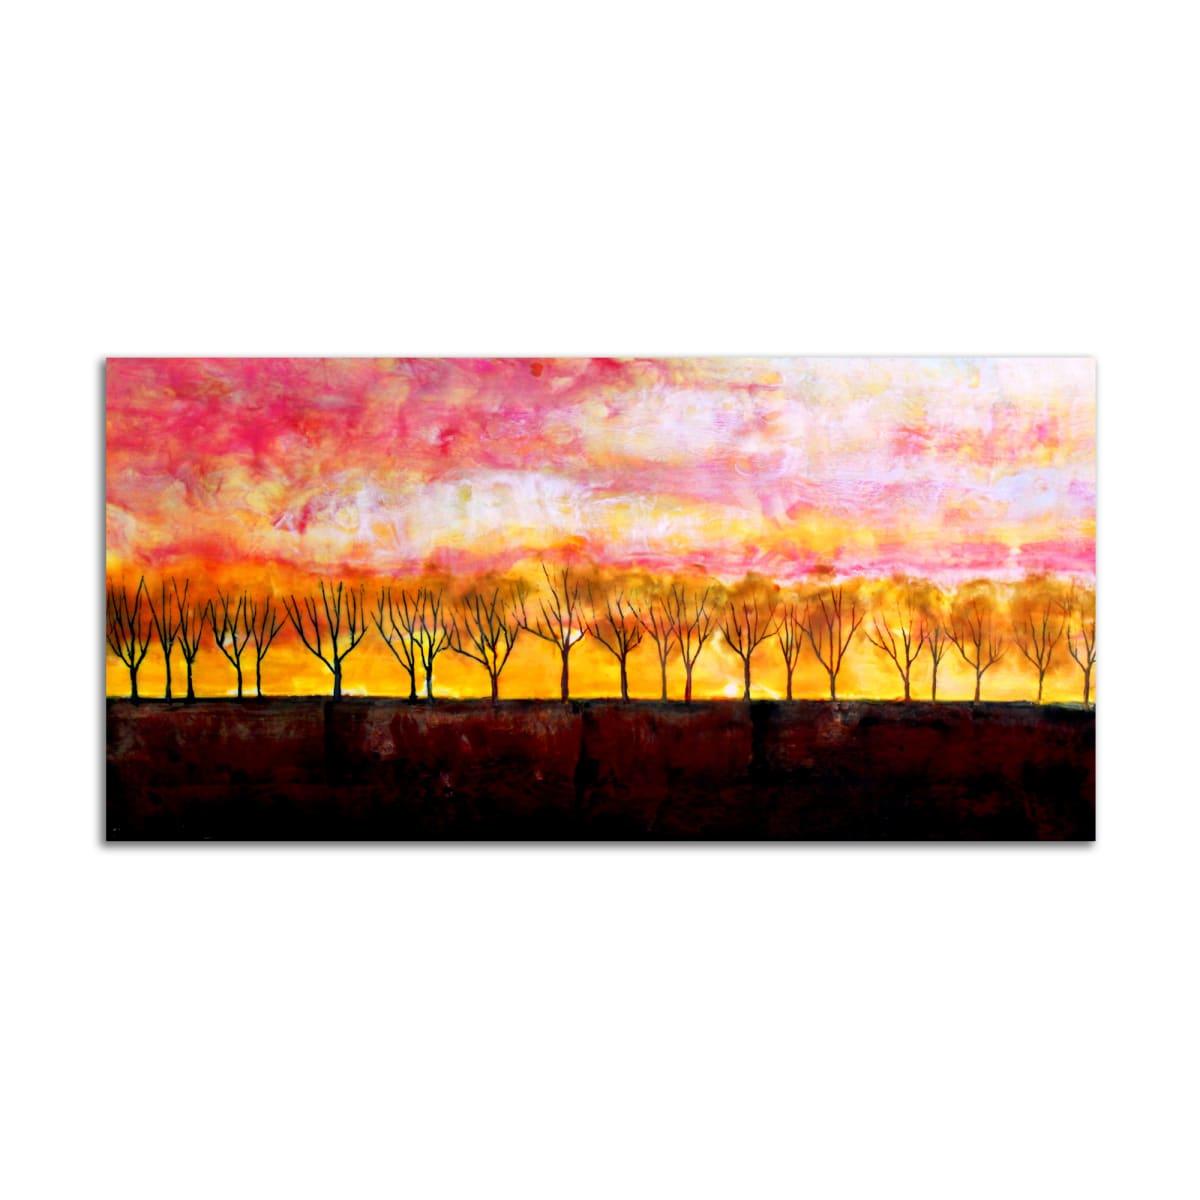 Sunset Trees by T.D. Scott